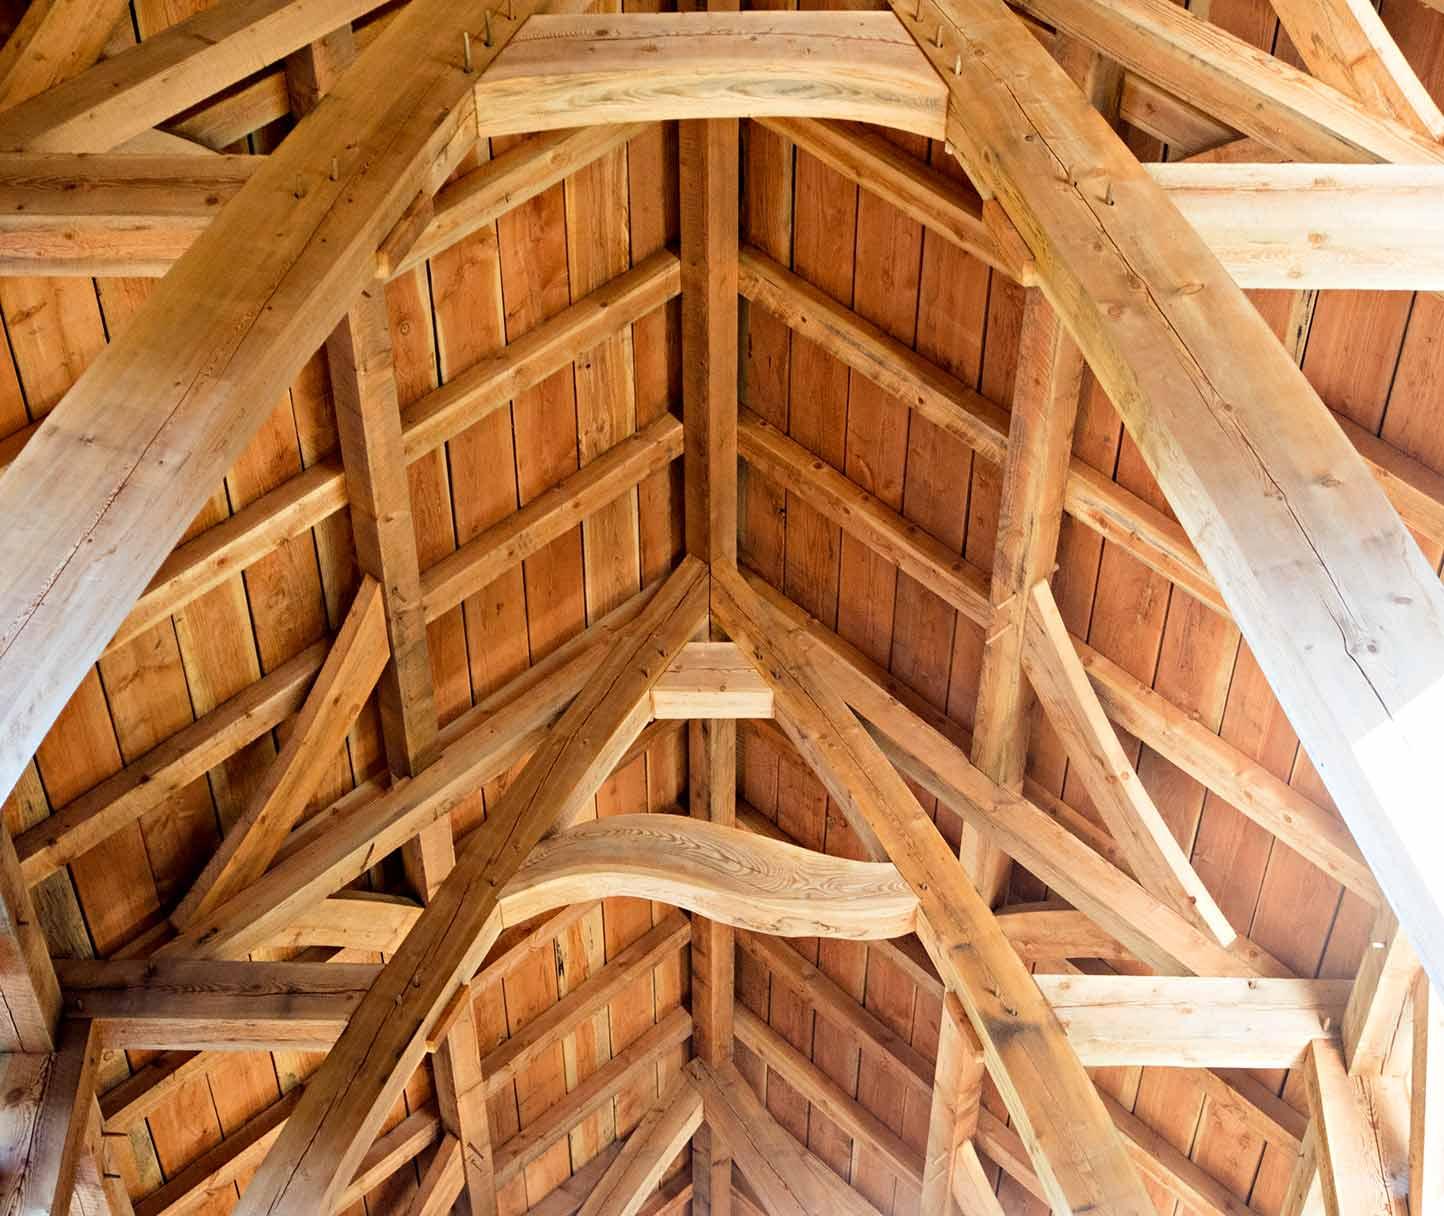 Oregon Timber Frame Barn 2014 The Shelter Blog